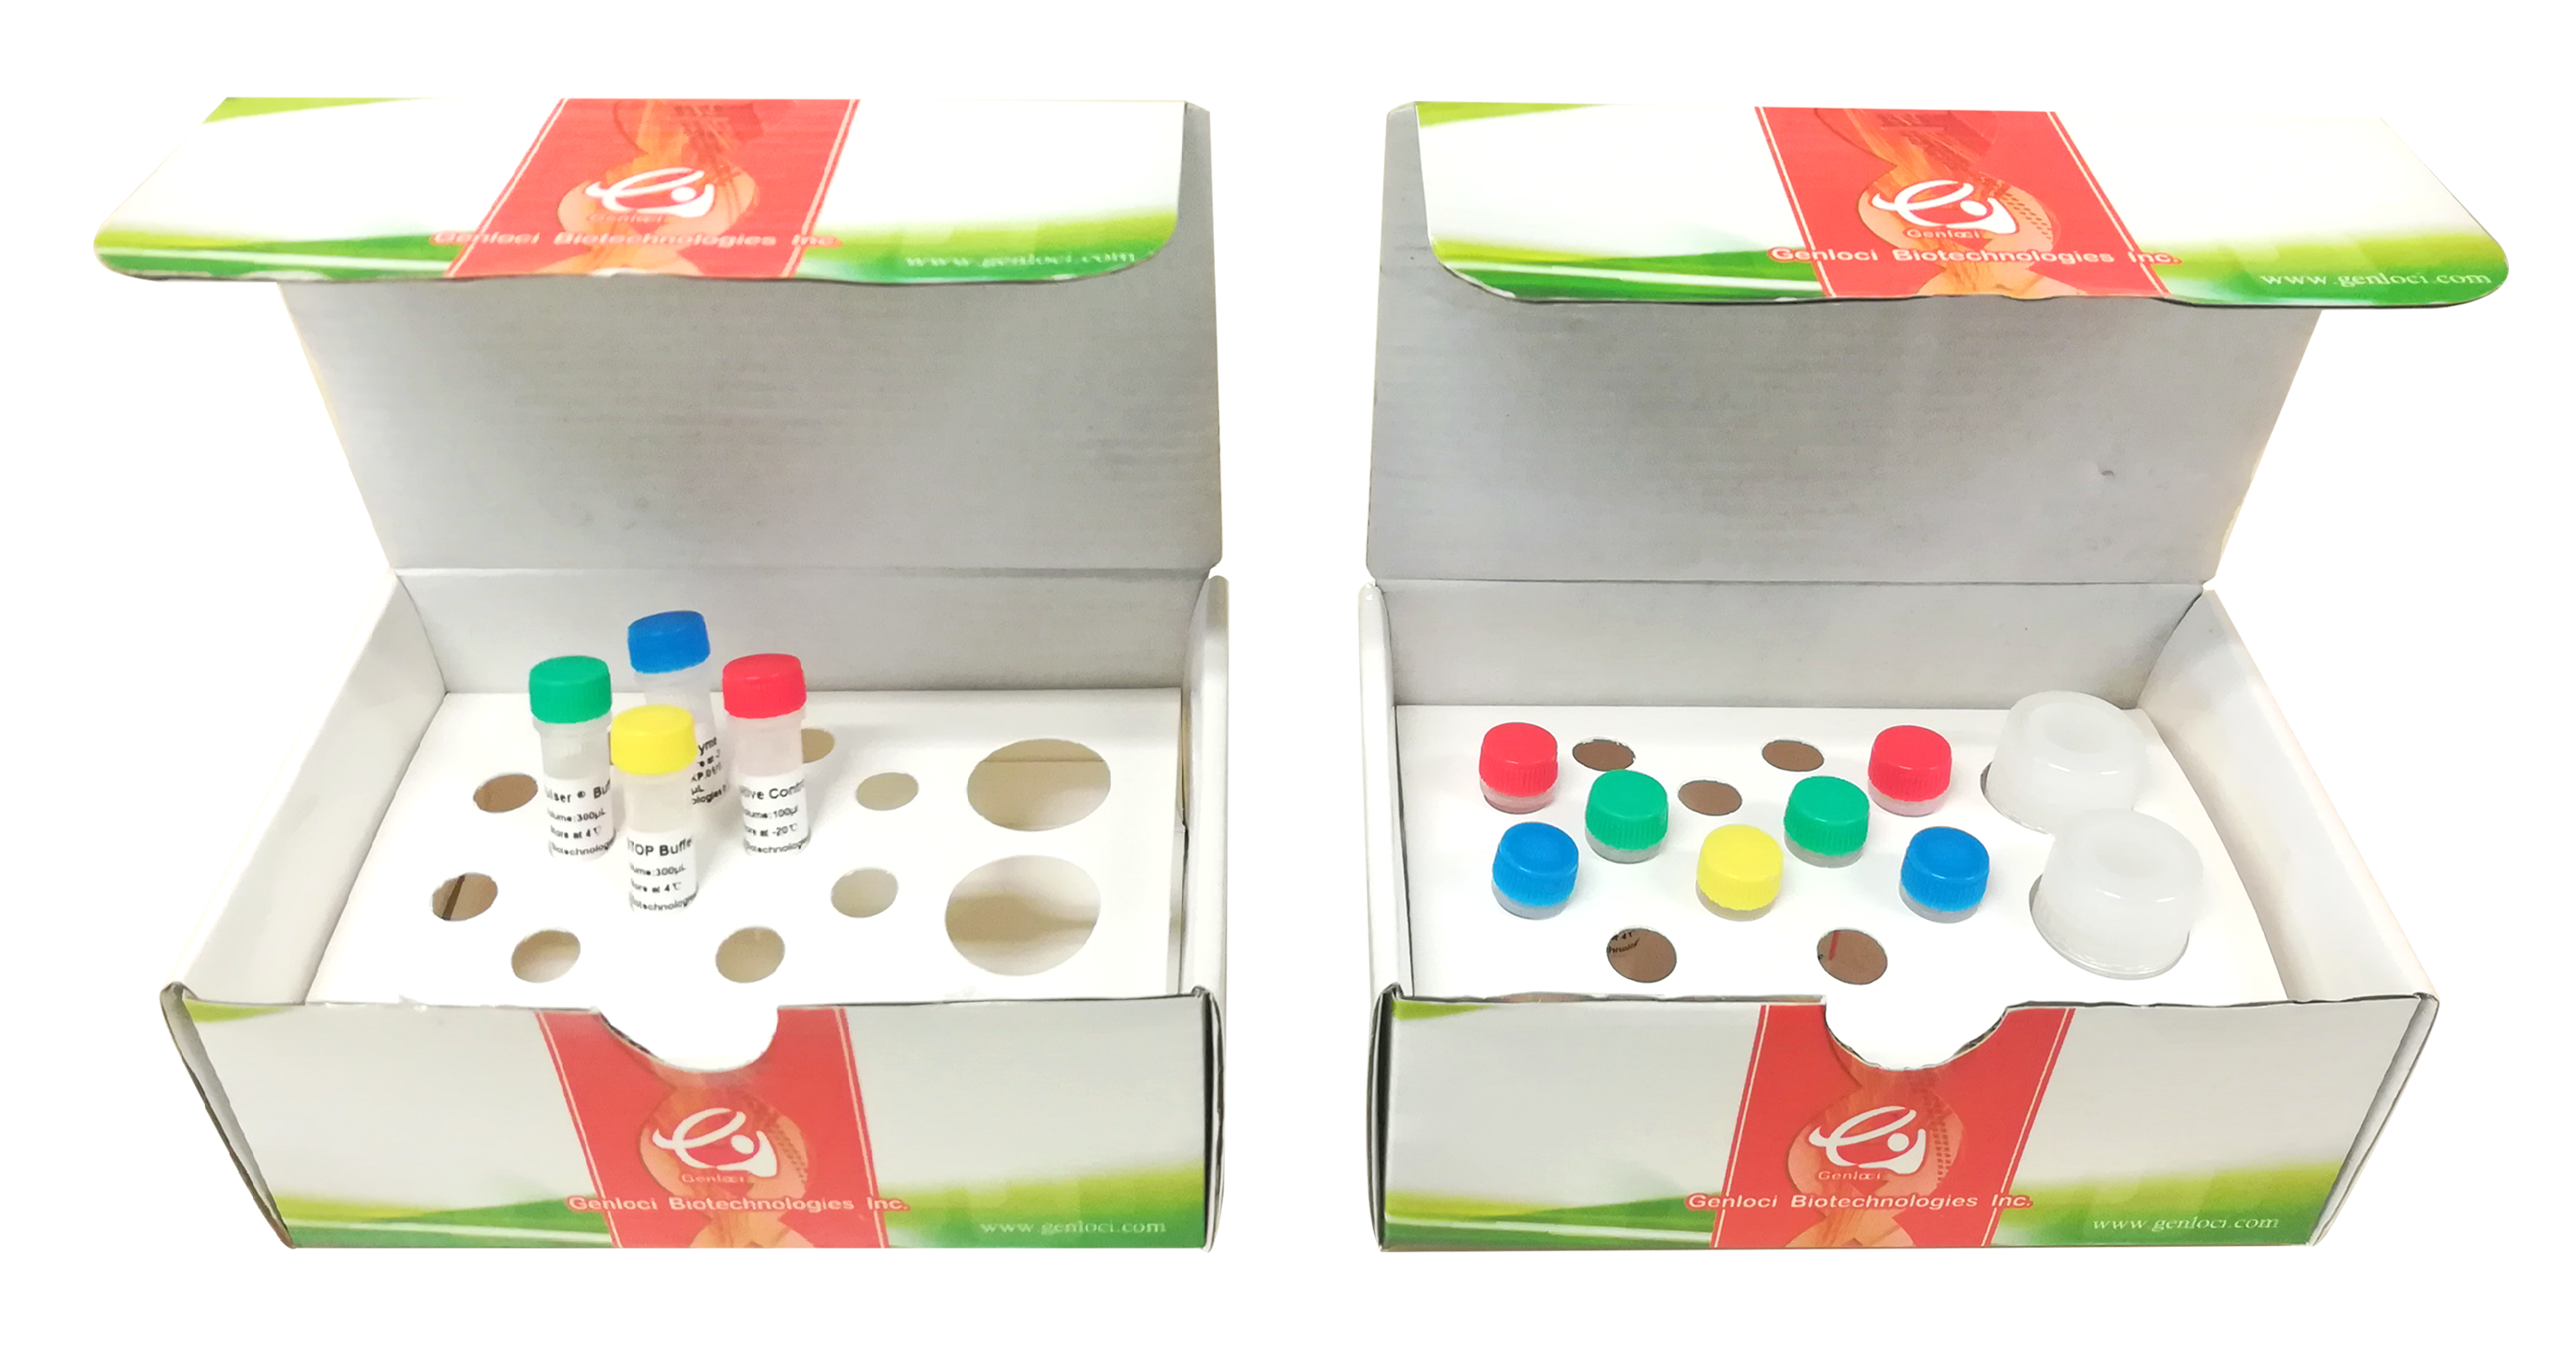 Cruiser® 基因敲除检测试剂盒(100rxns)